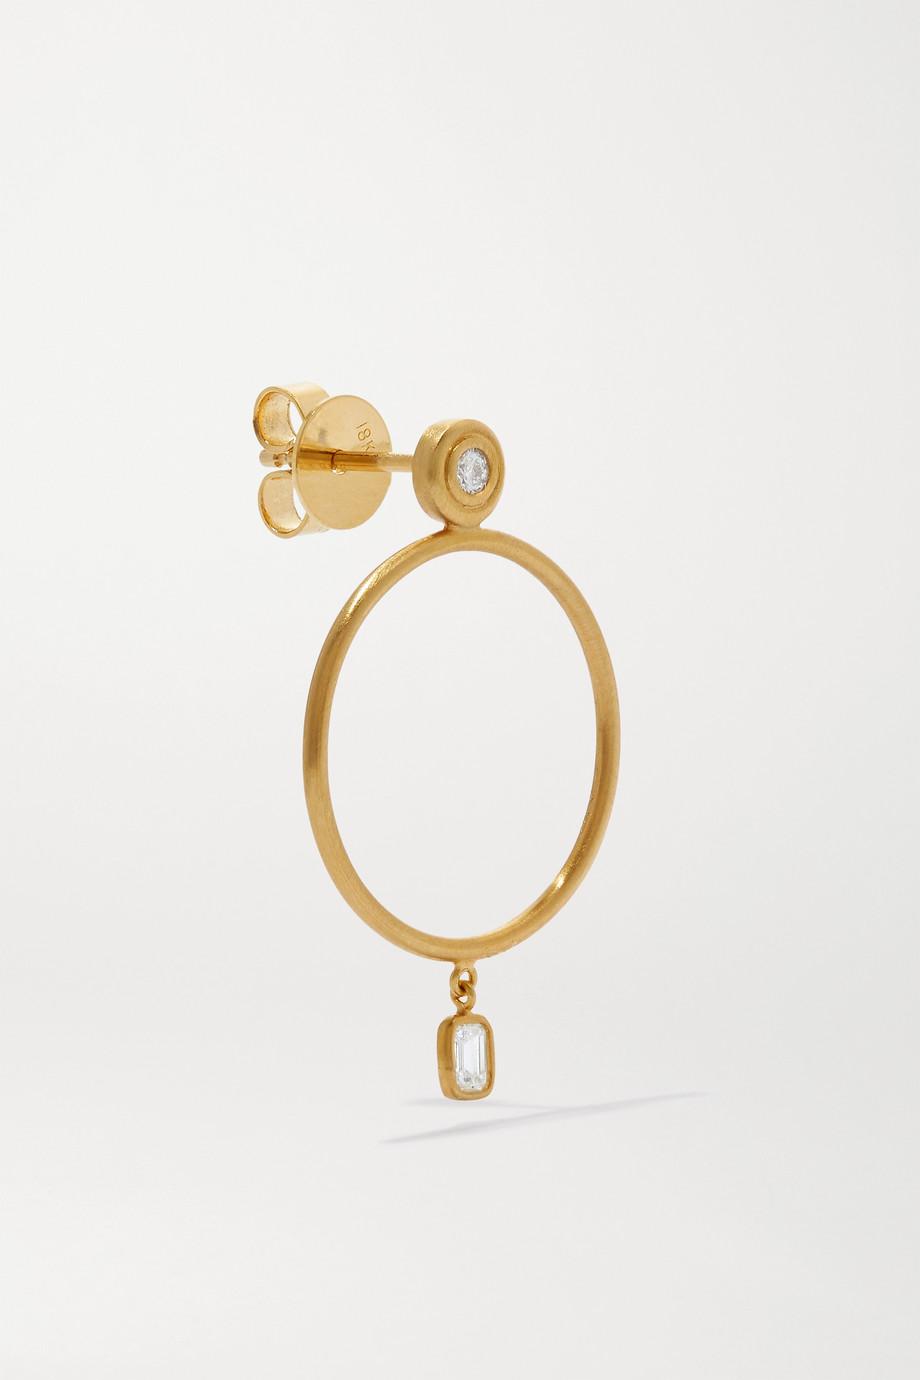 Octavia Elizabeth Sanded 18-karat gold diamond hoop earrings